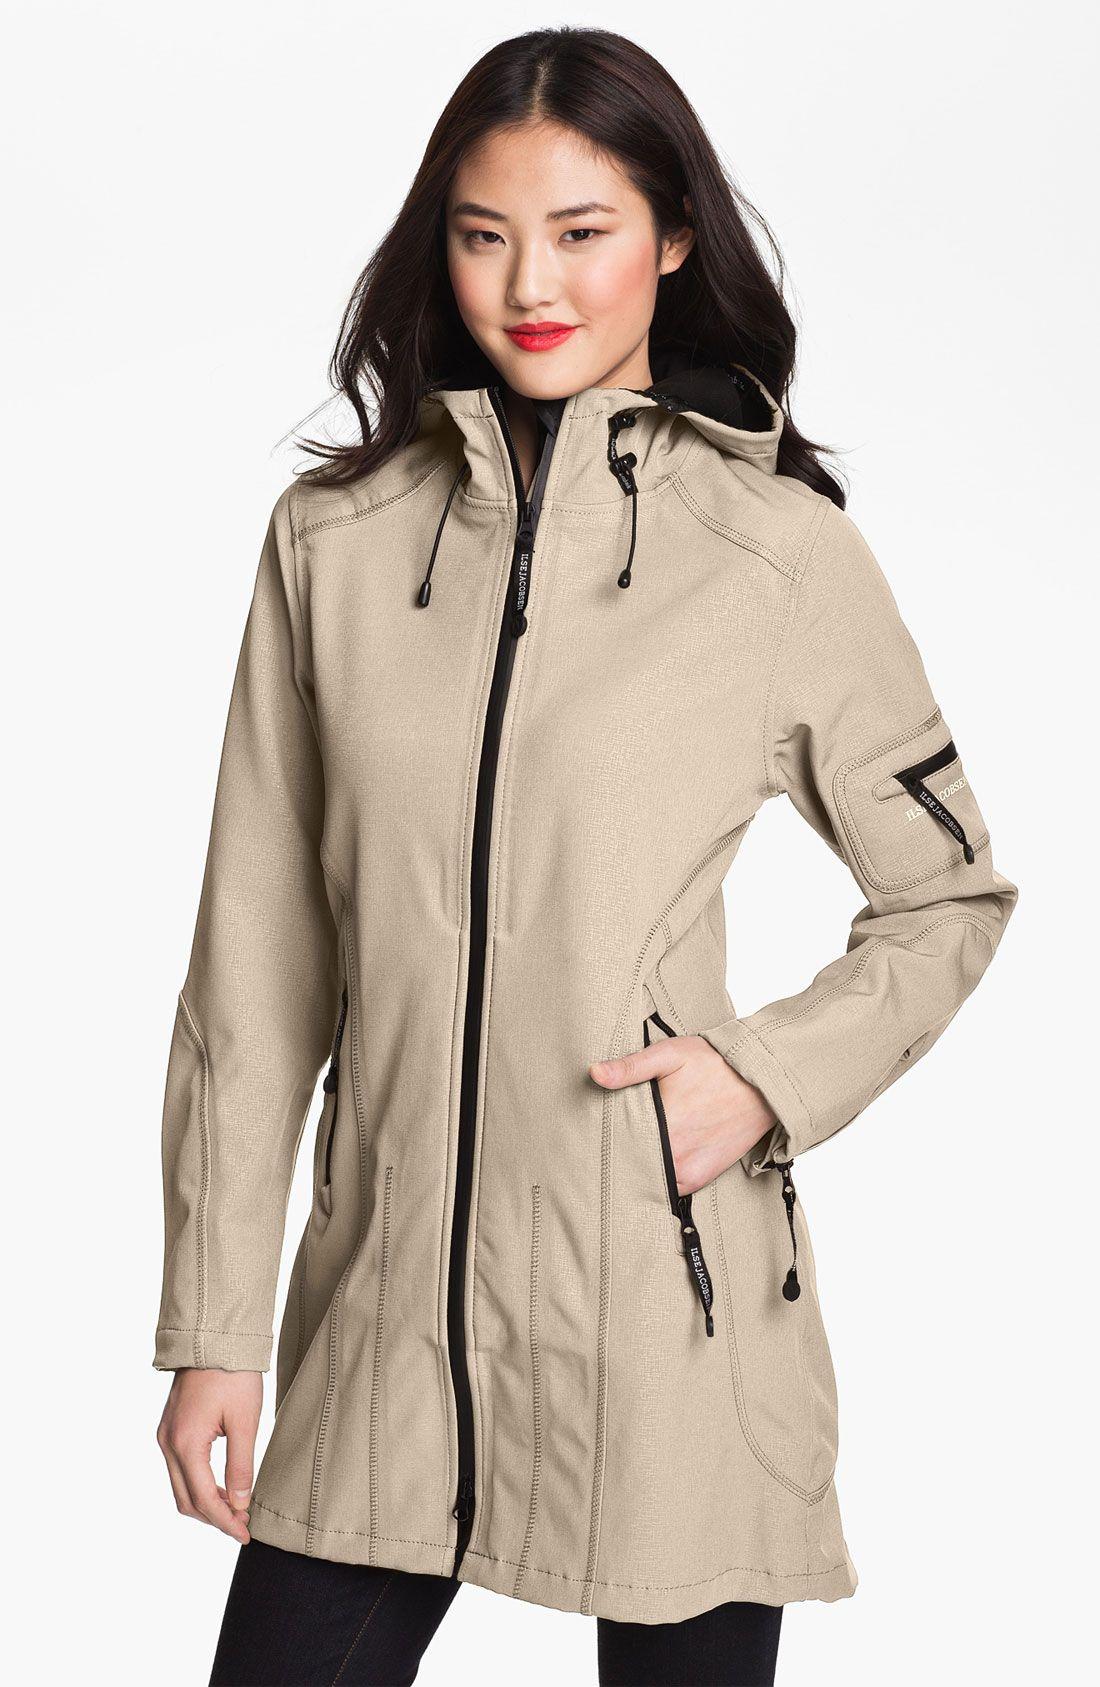 Rain 7 Hooded Water Resistant Coat | Raincoat, Rain jacket and Rain